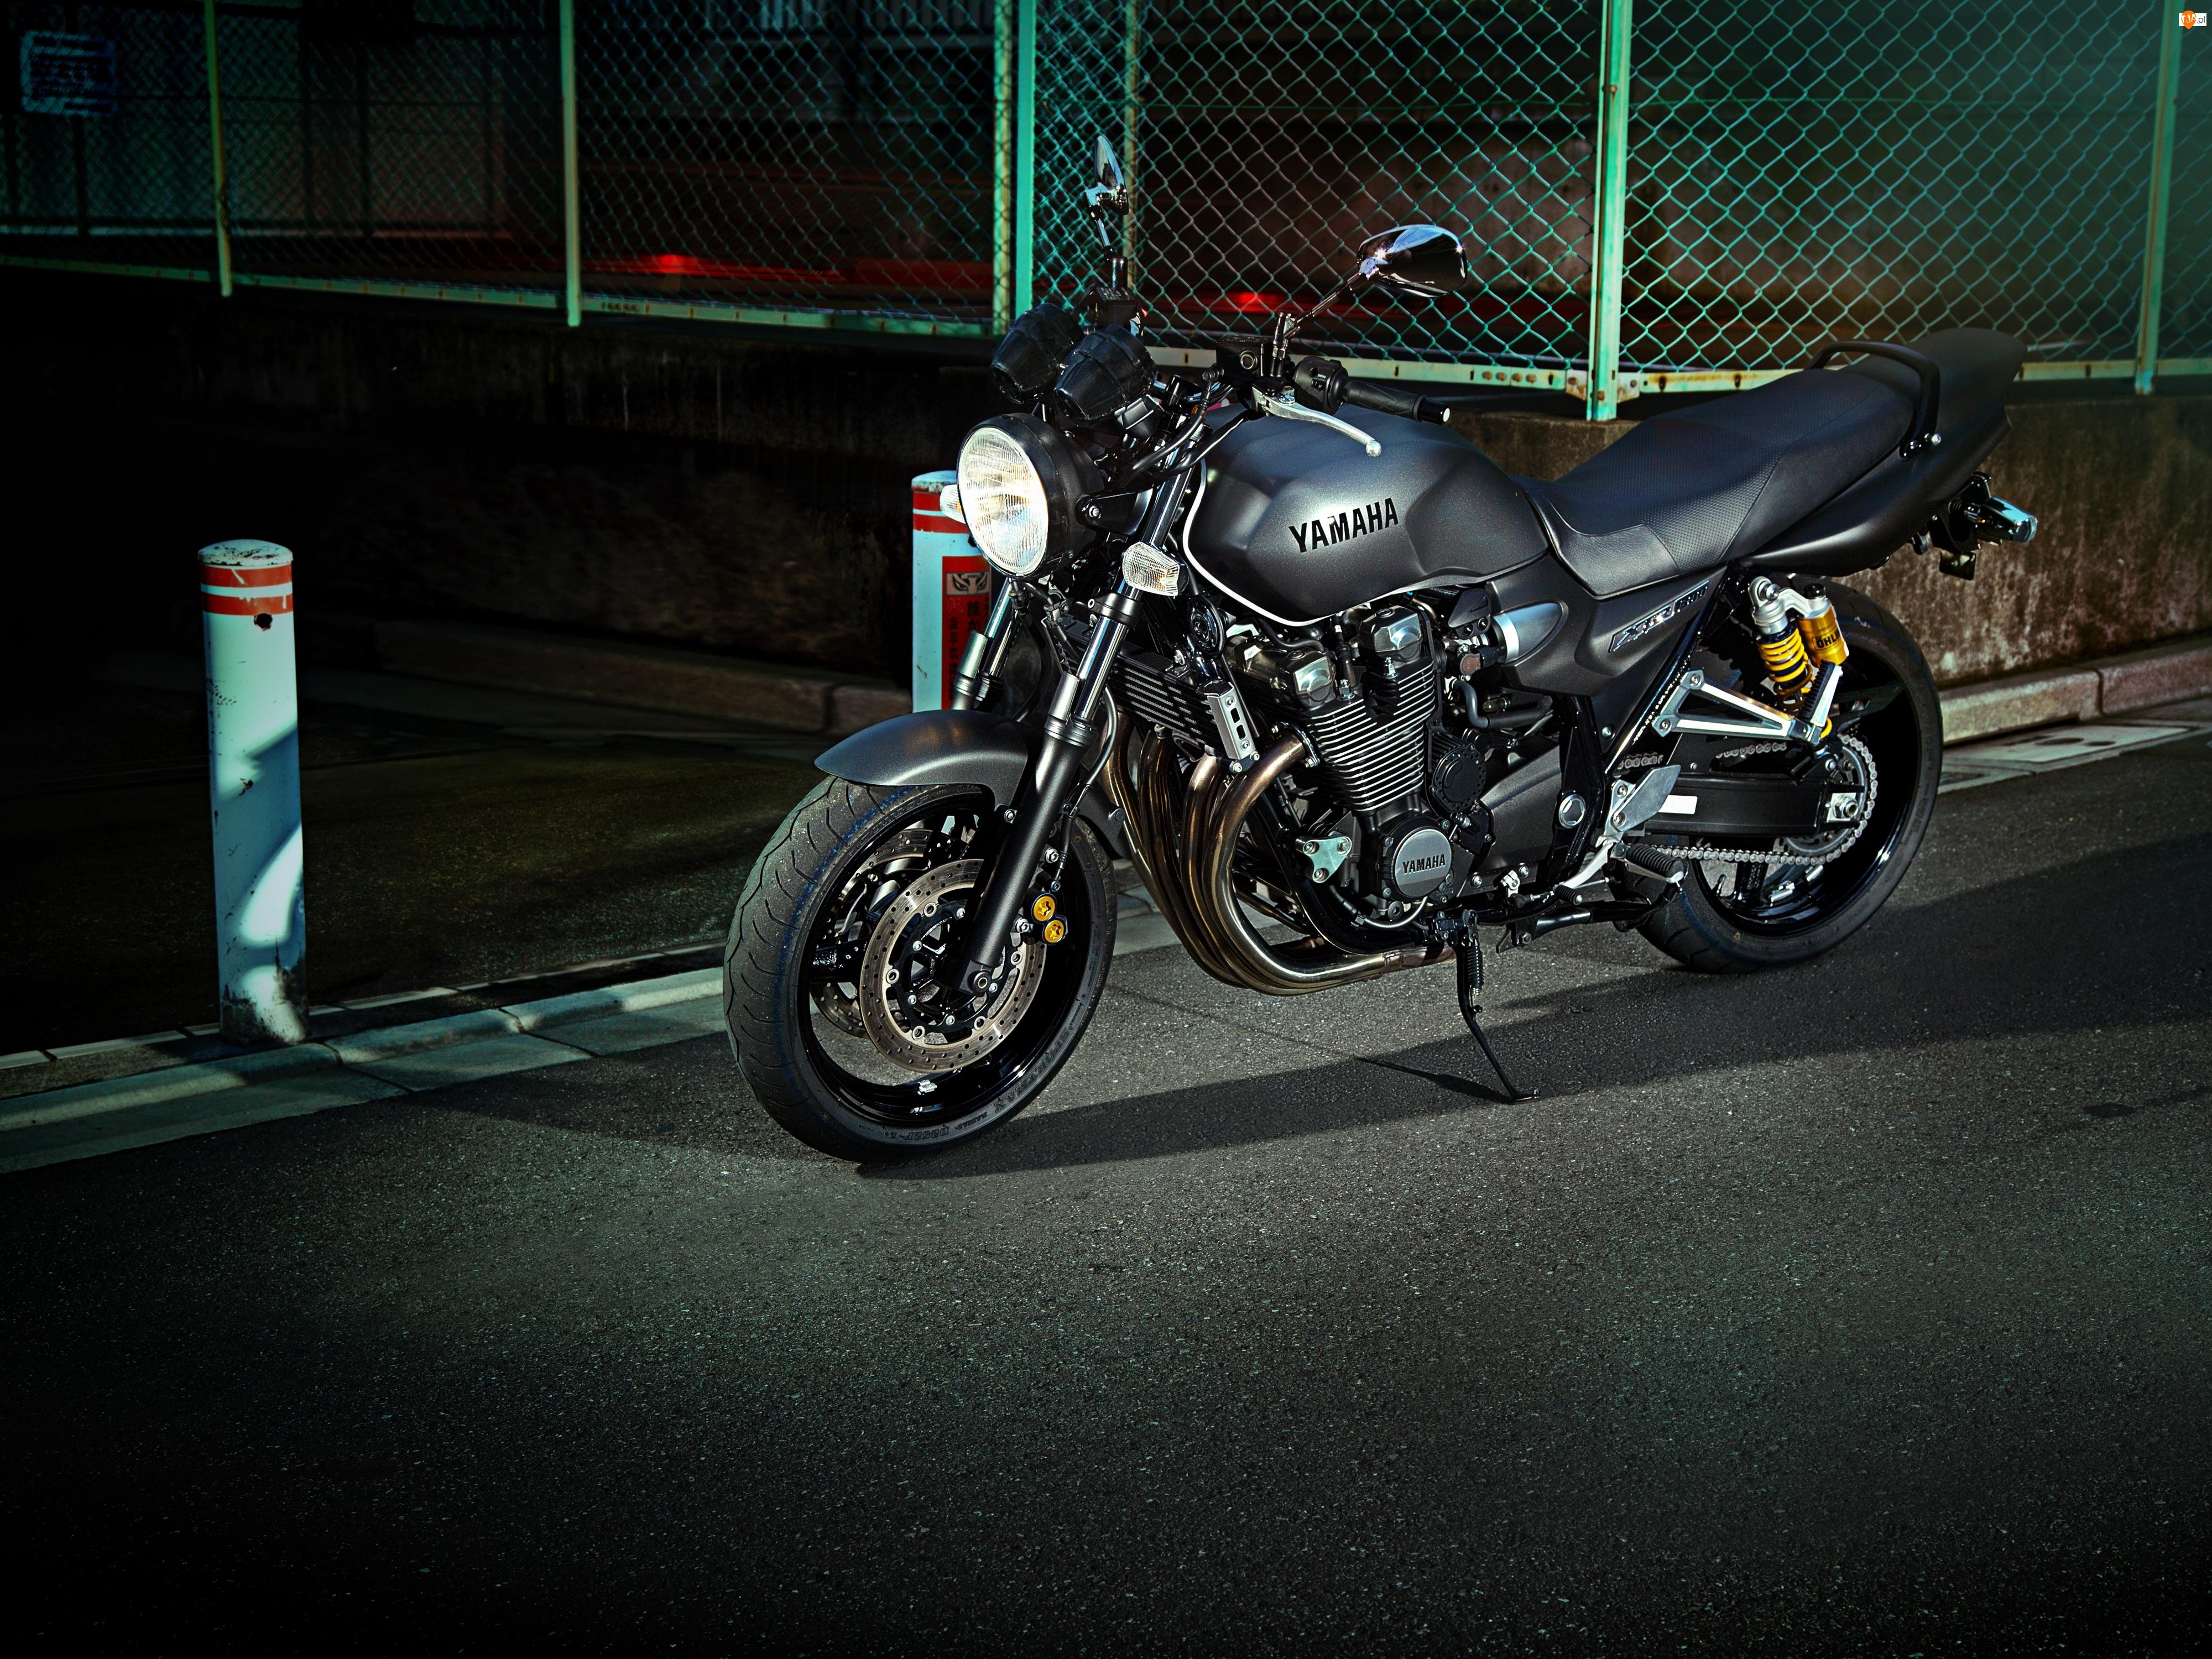 2014, Motocykl, Yamaha XJR1300